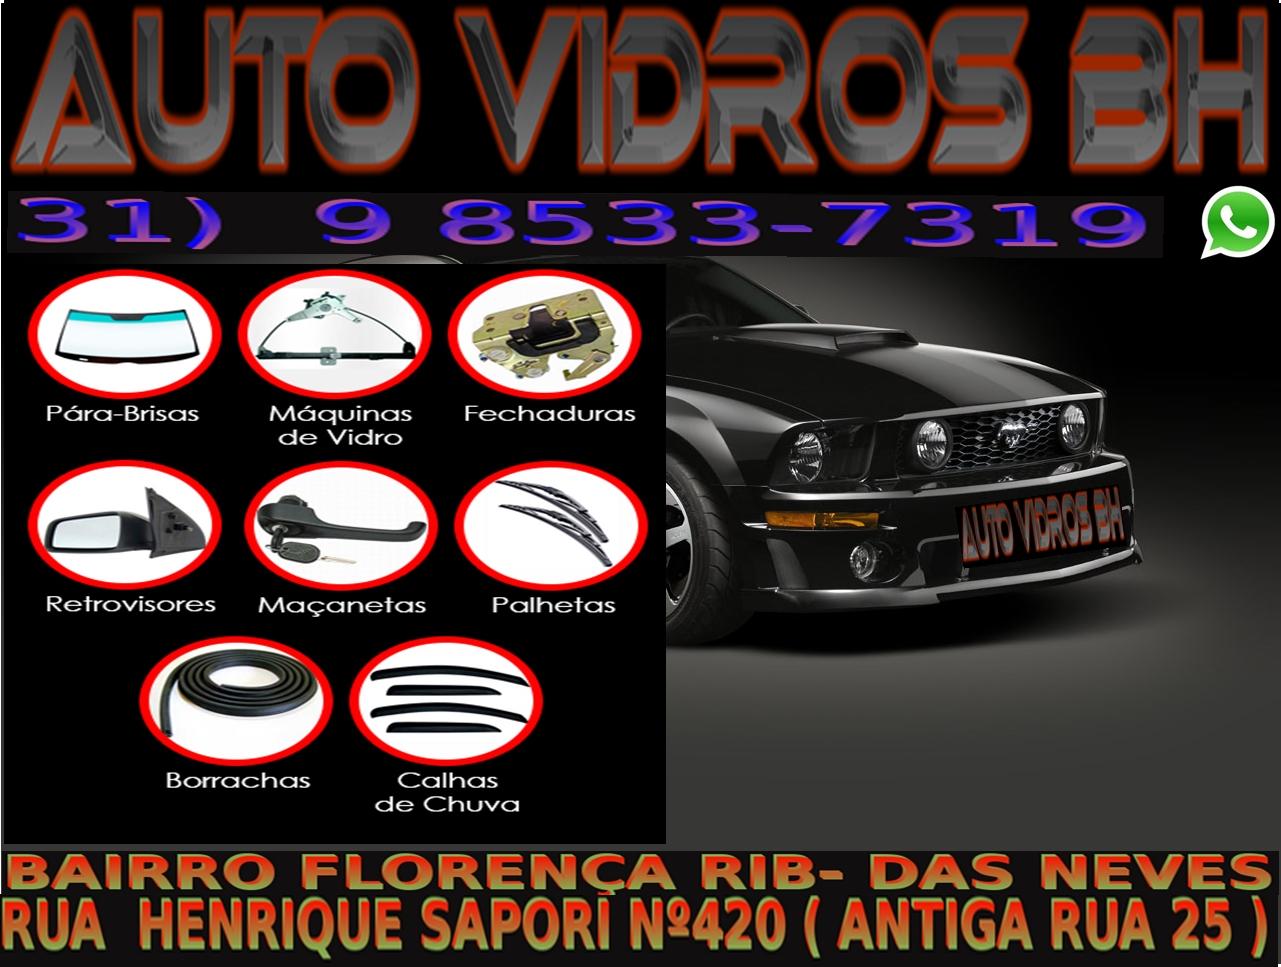 AUTO VIDROS BH